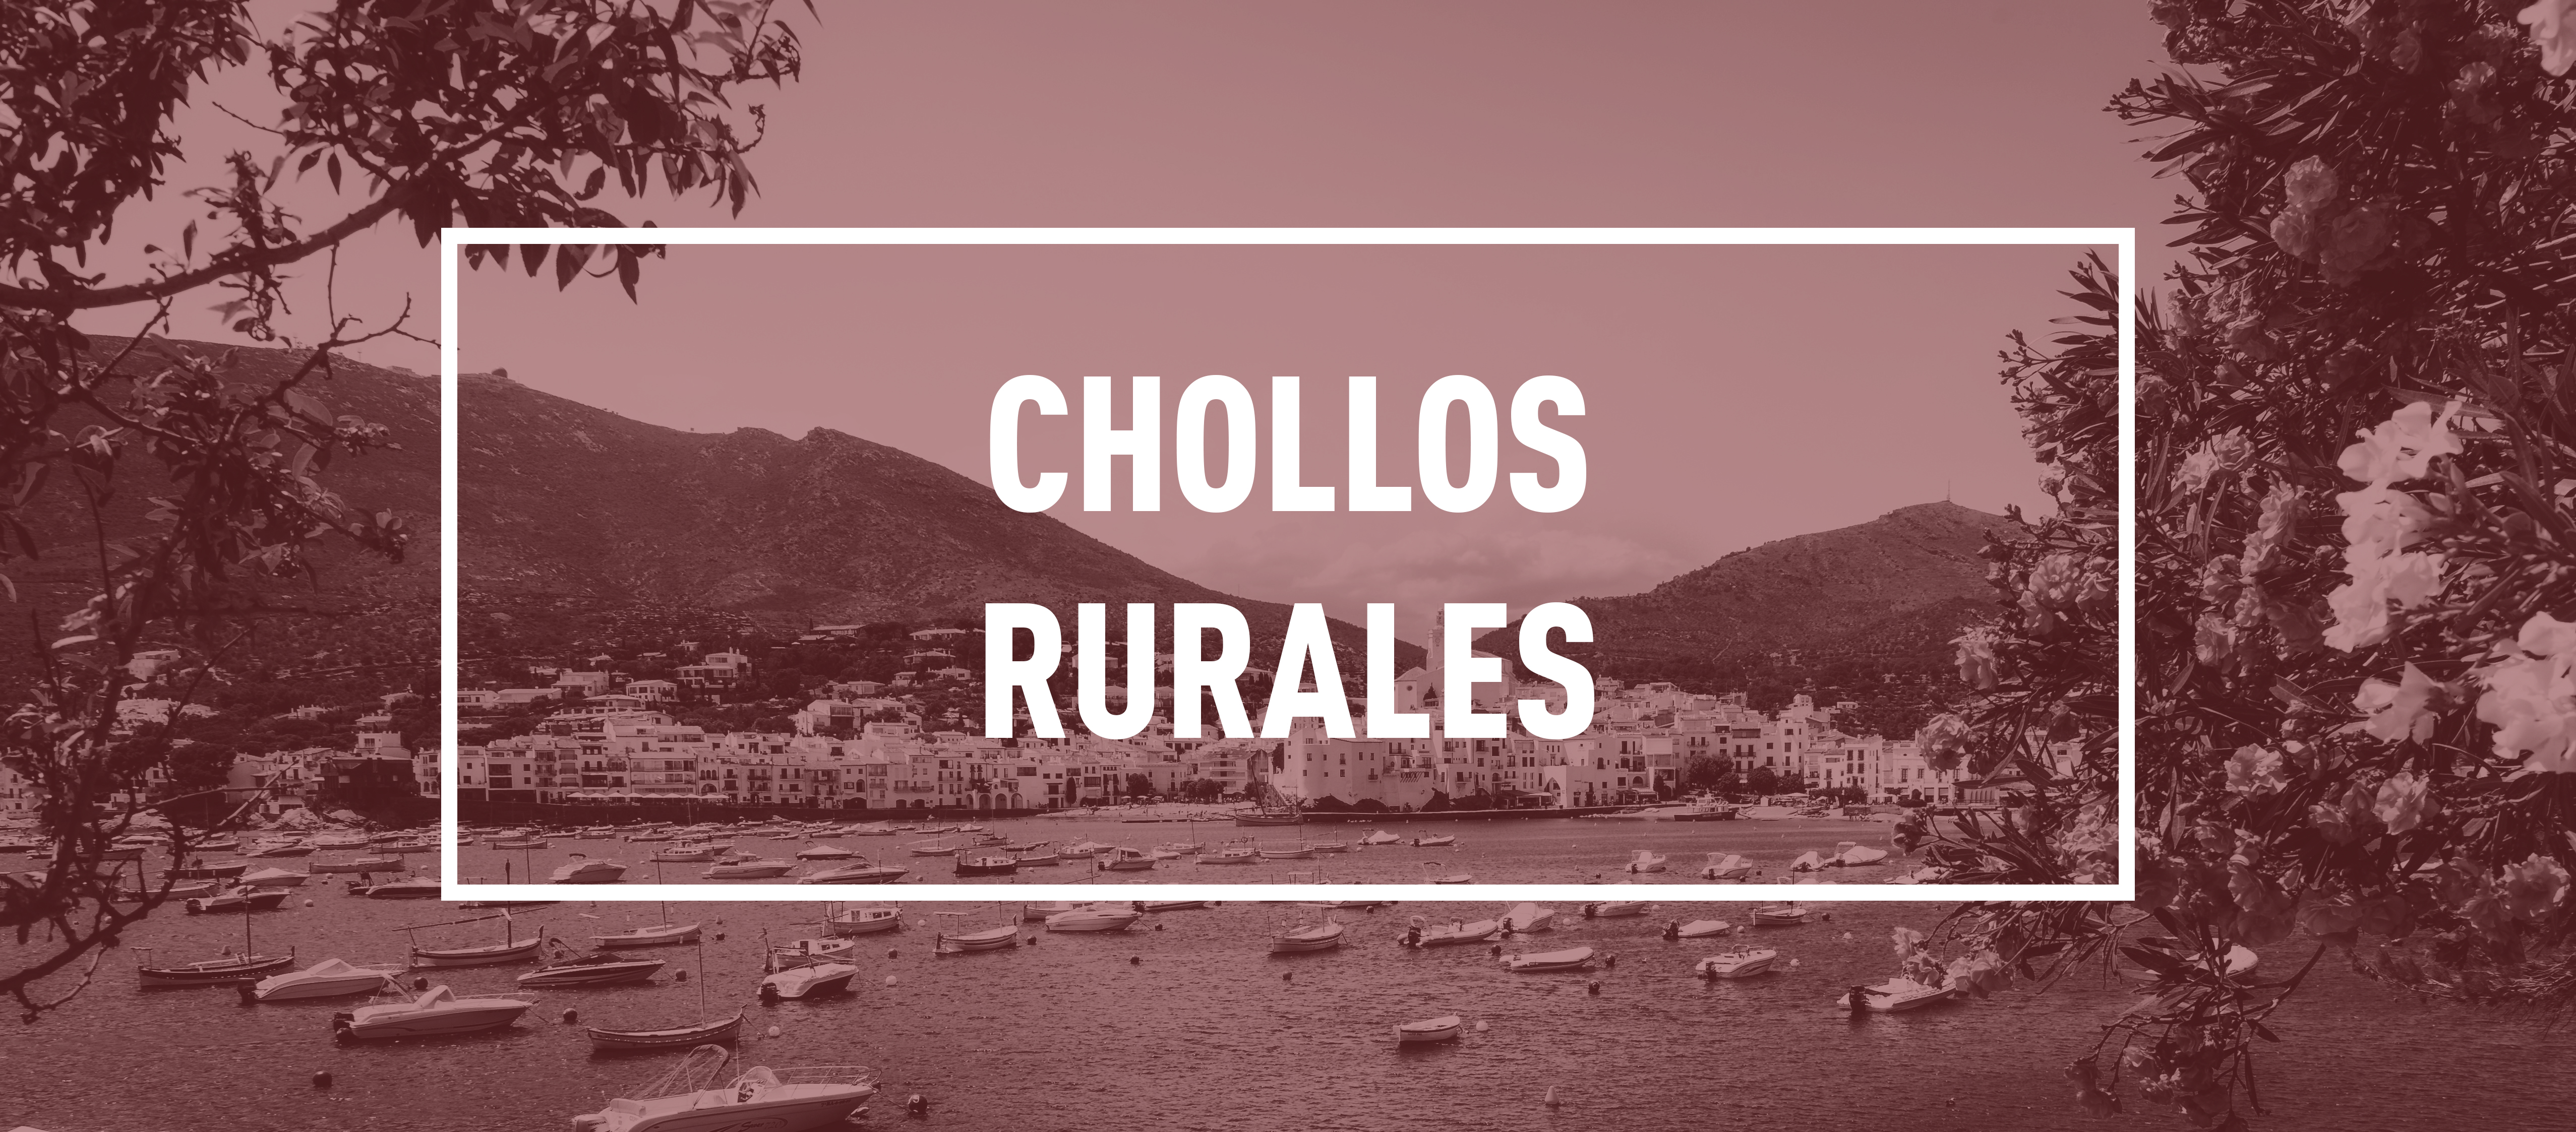 chollos-rurales